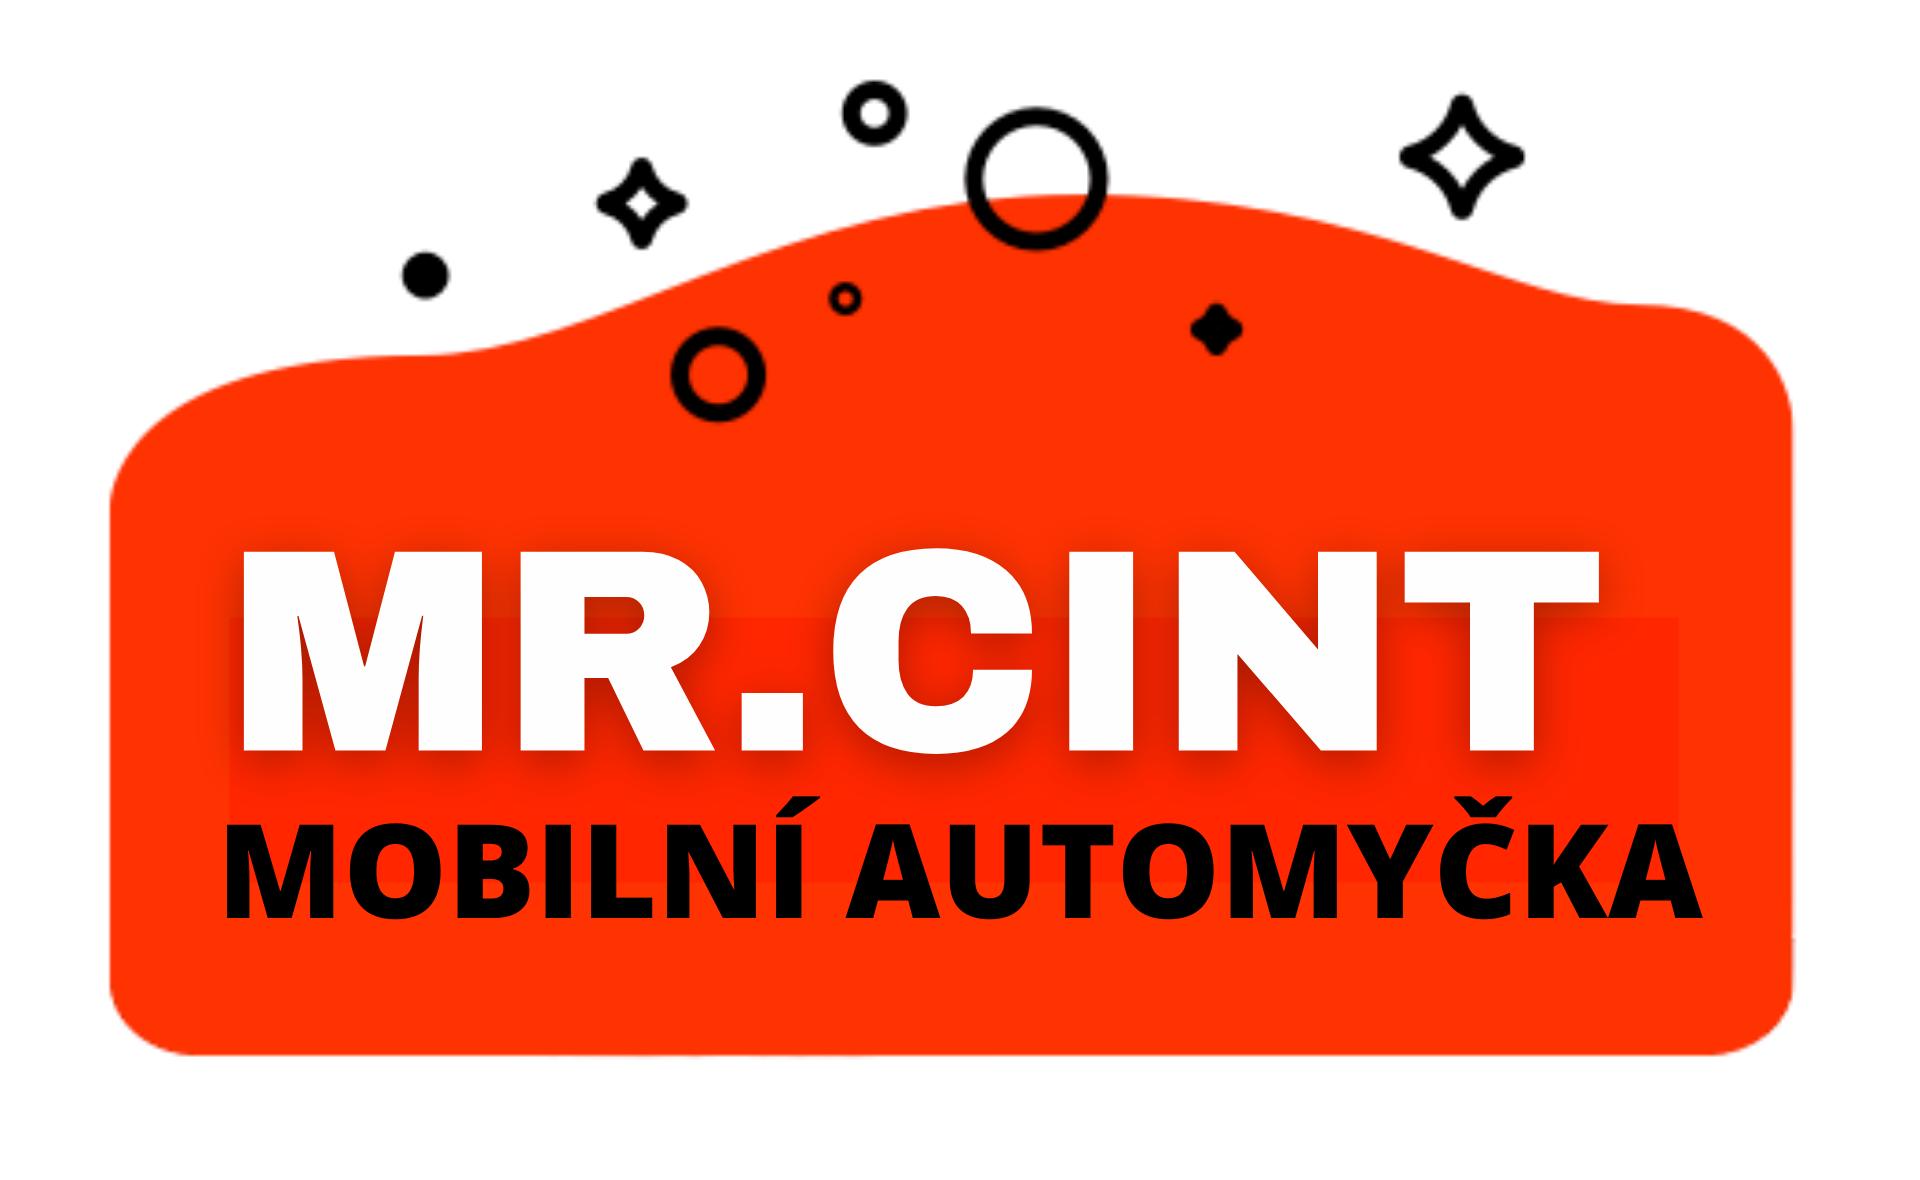 e-shop a Mobilní Automyčka Mr.Cint